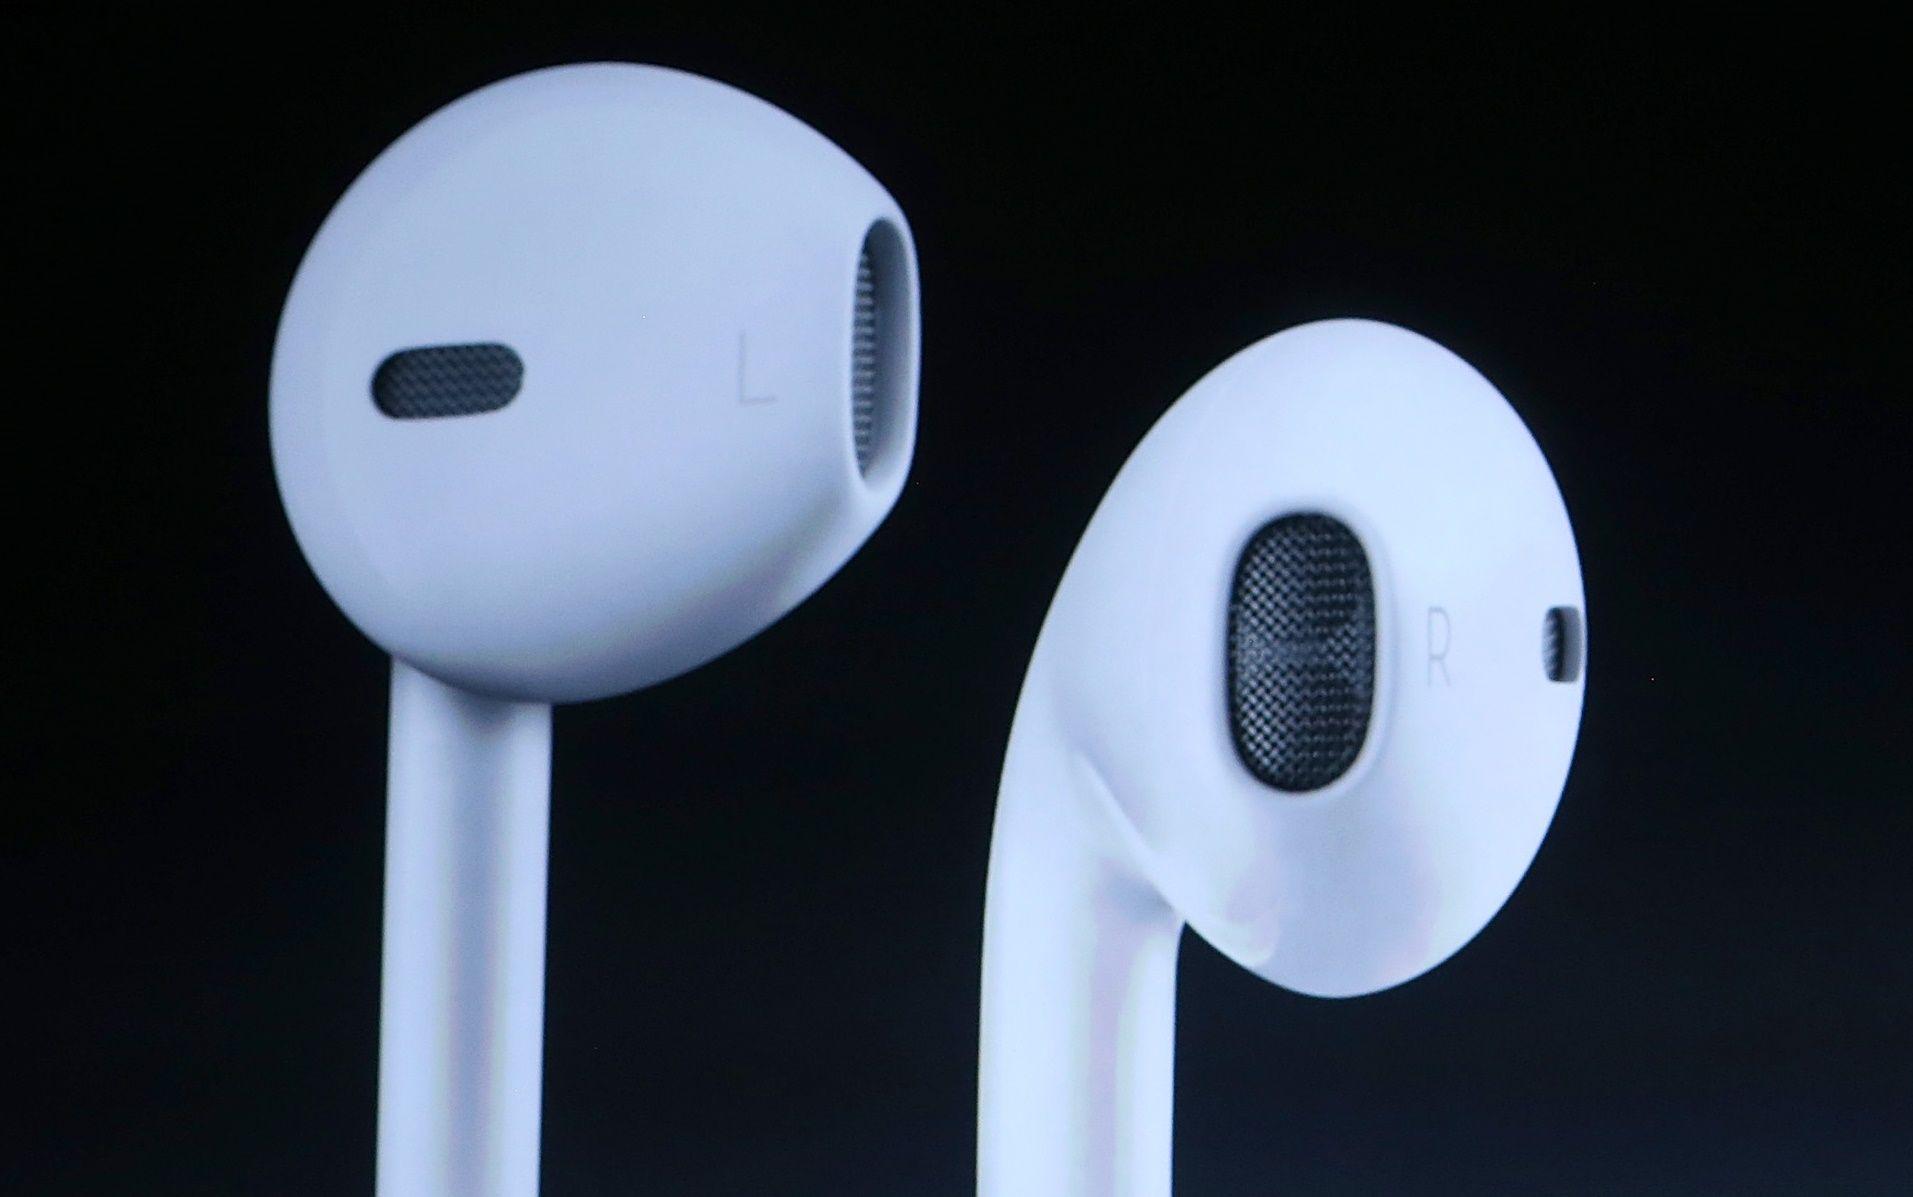 iphone 7 apple airpod wireless headphones